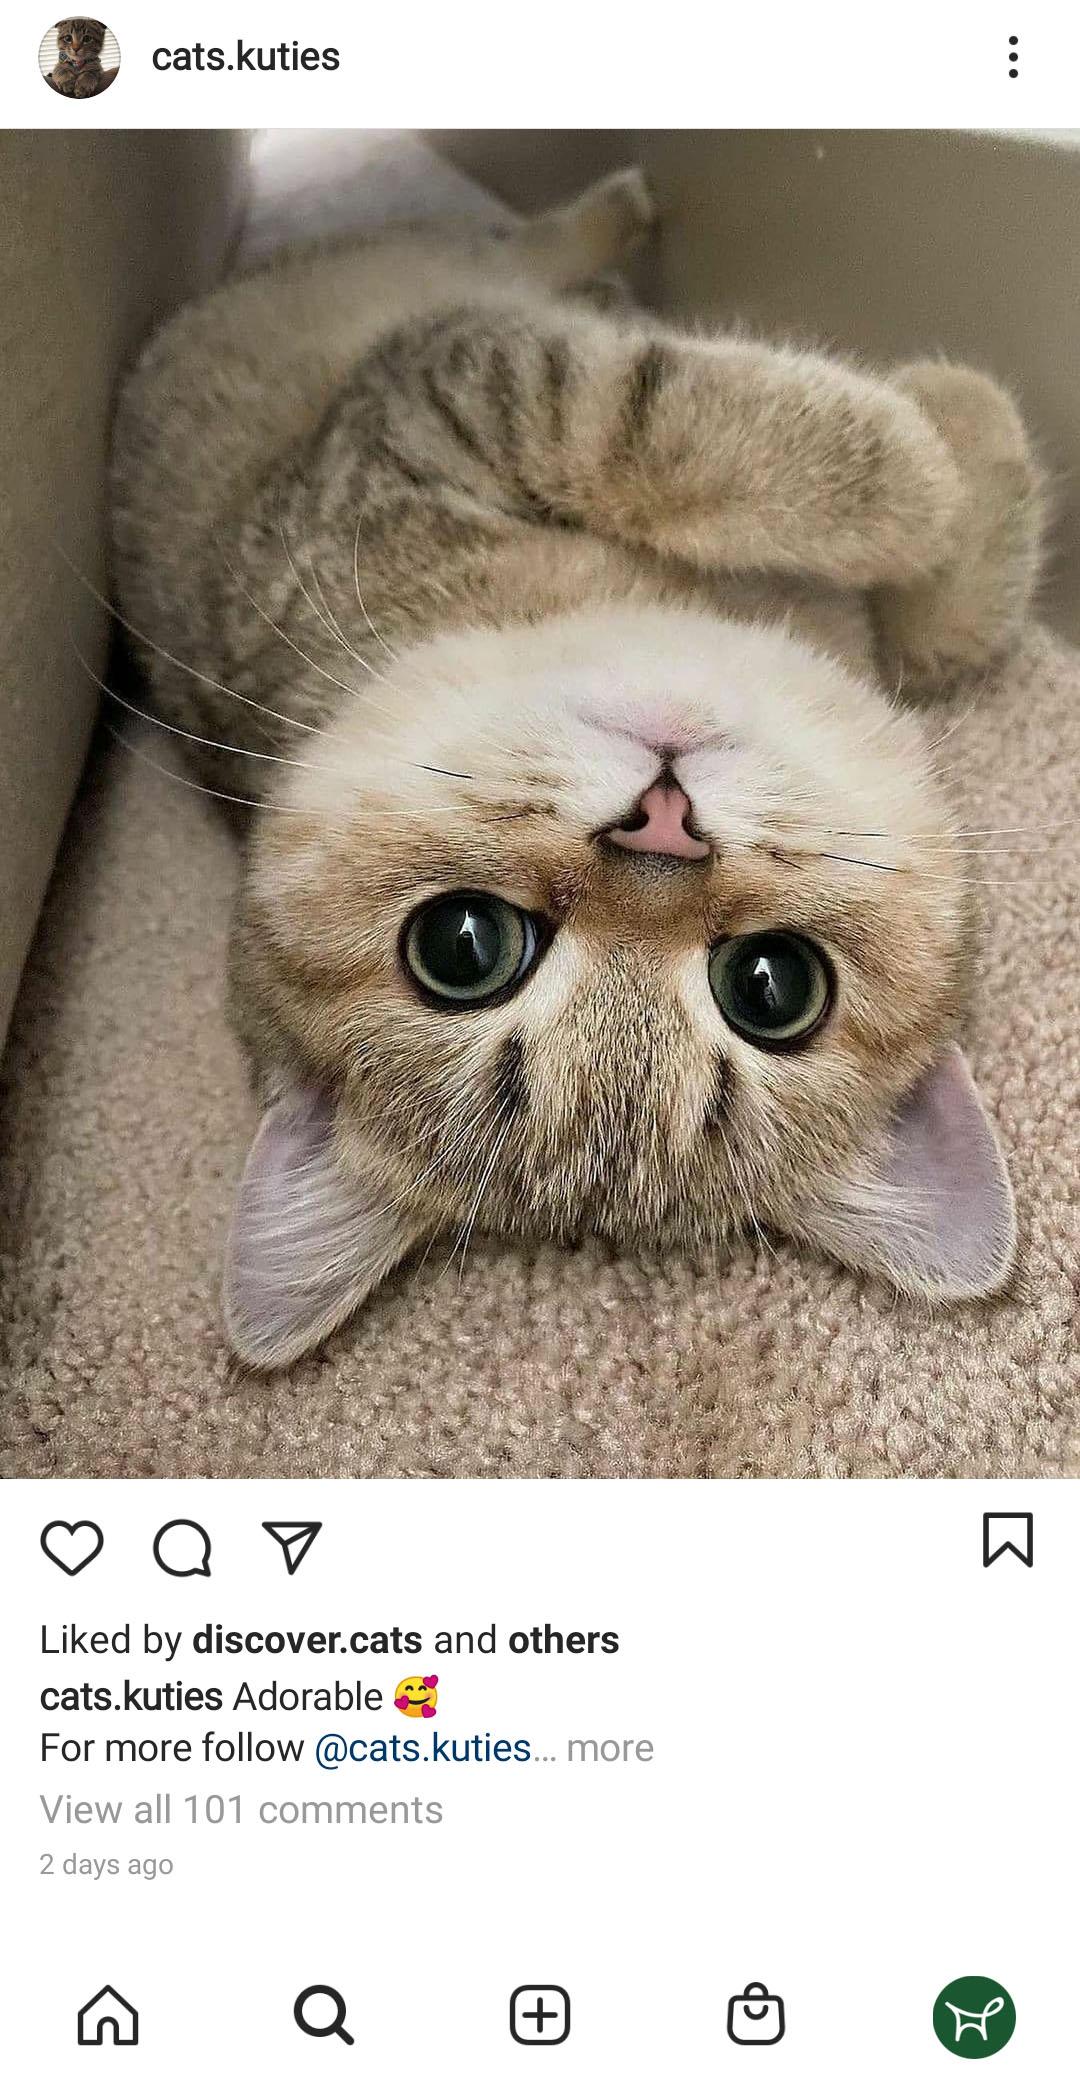 cat lying ont the floor